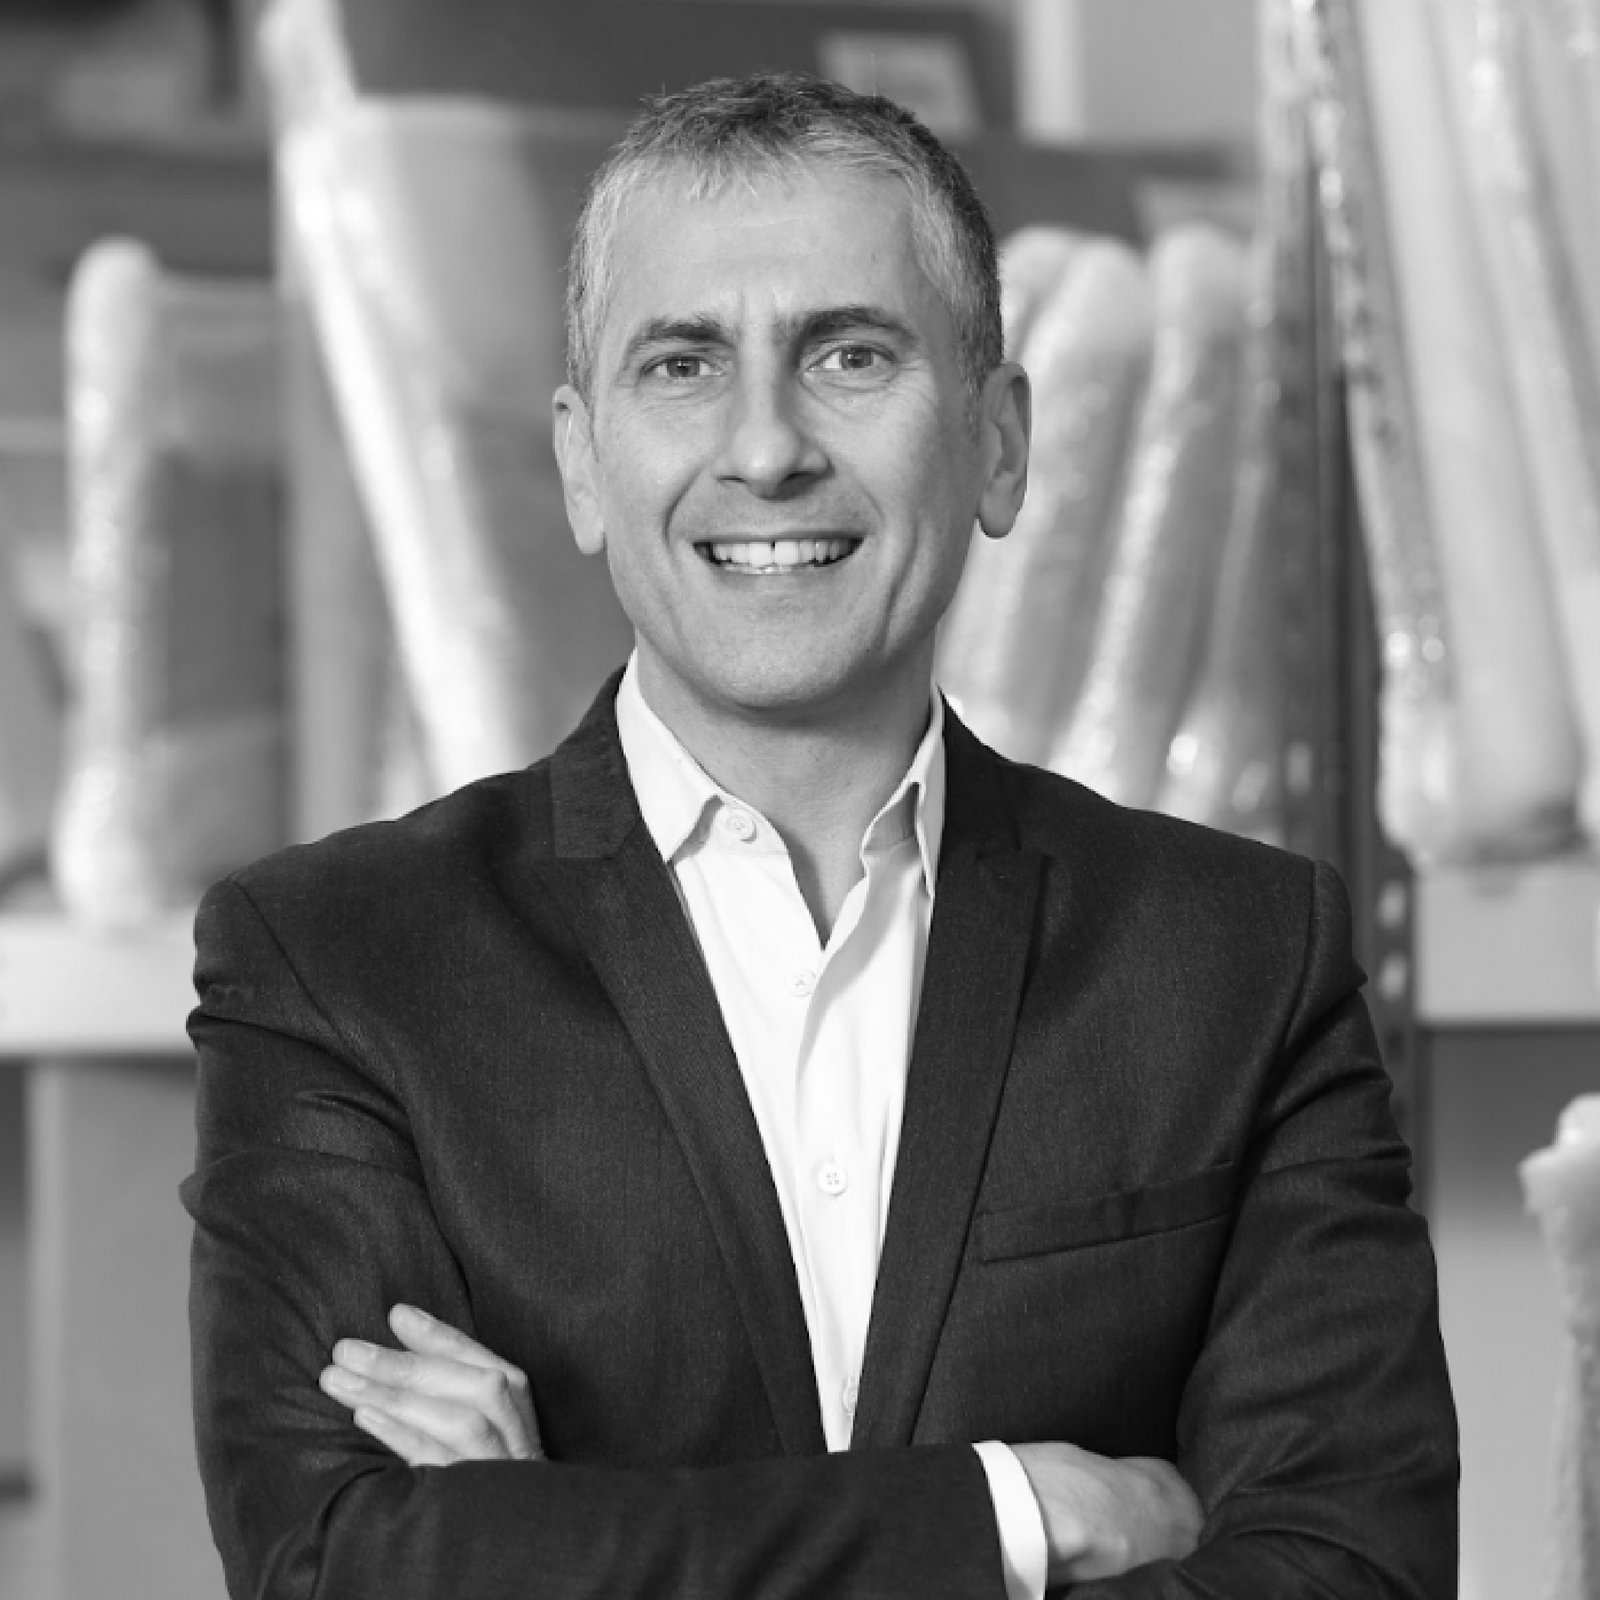 Tom Toumazis - MBE, Tagsmart, Executive Chairman